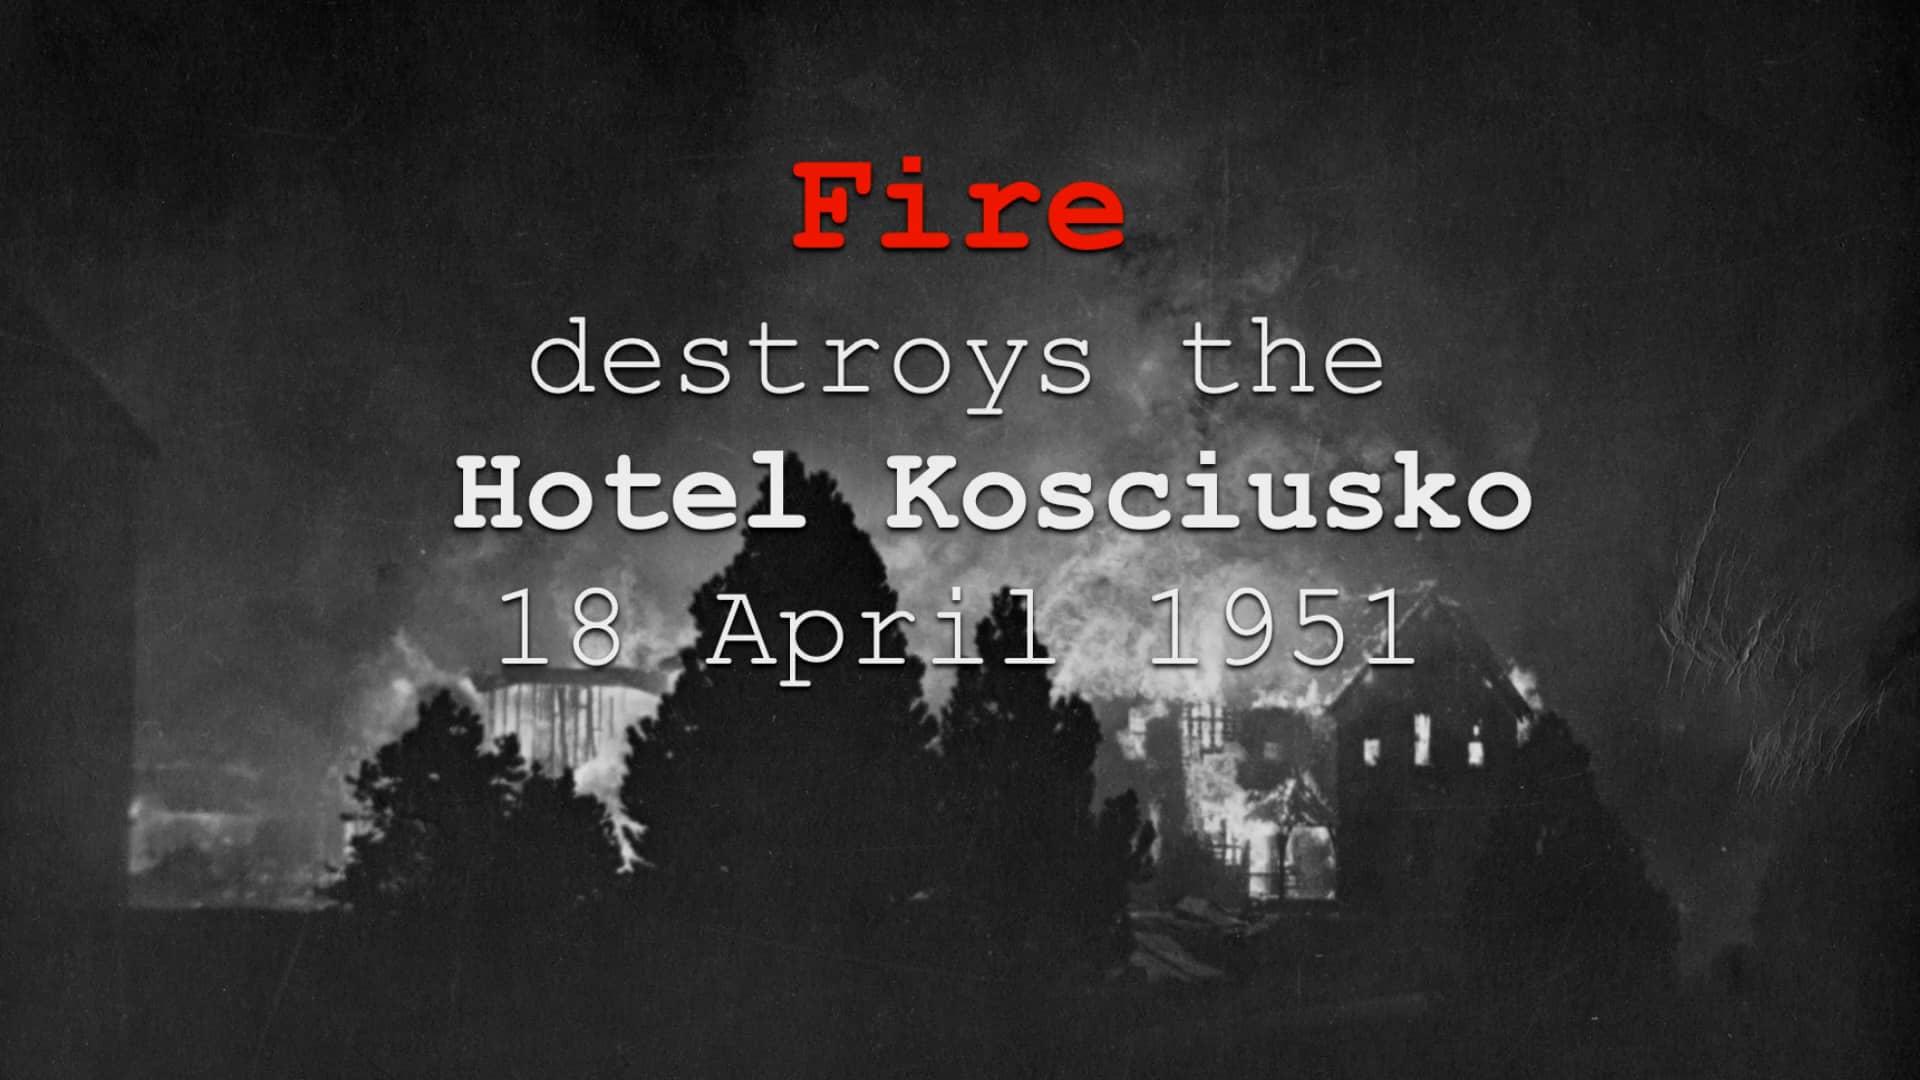 Fire destroys the Hotel Kosciusko 18th April 1951